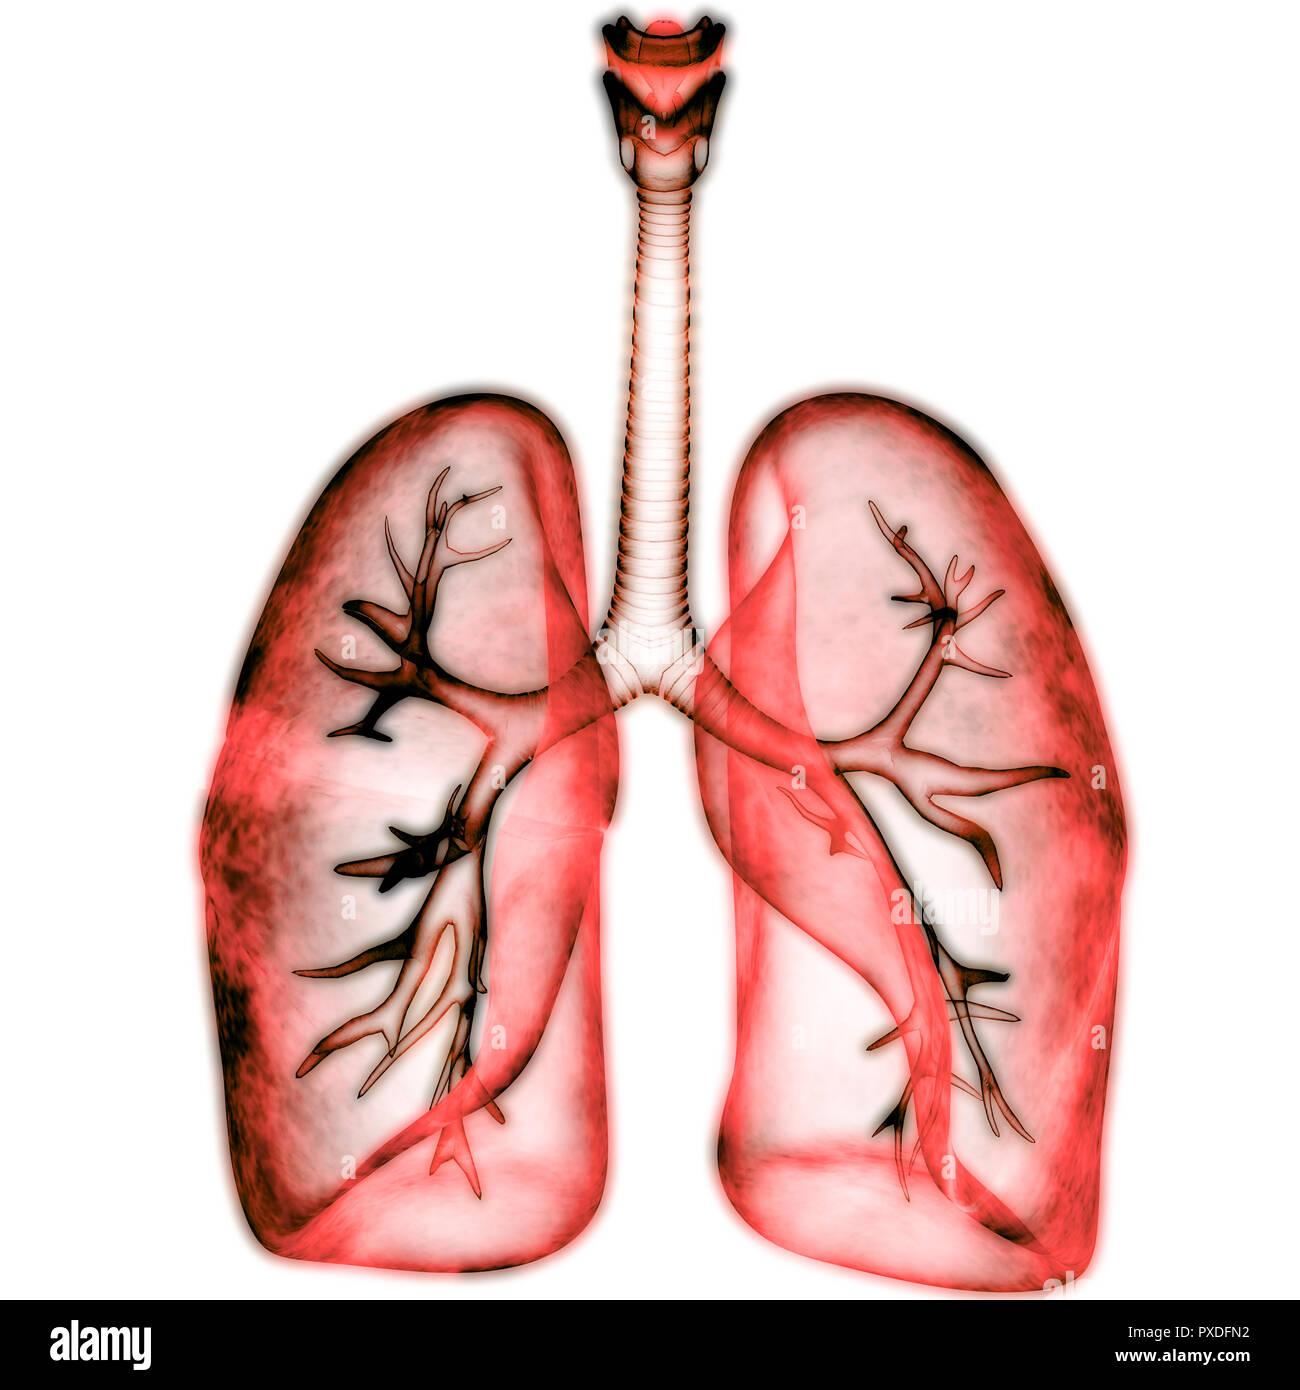 Human Respiratory System Lungs Anatomy Stock Photo 222803198 Alamy